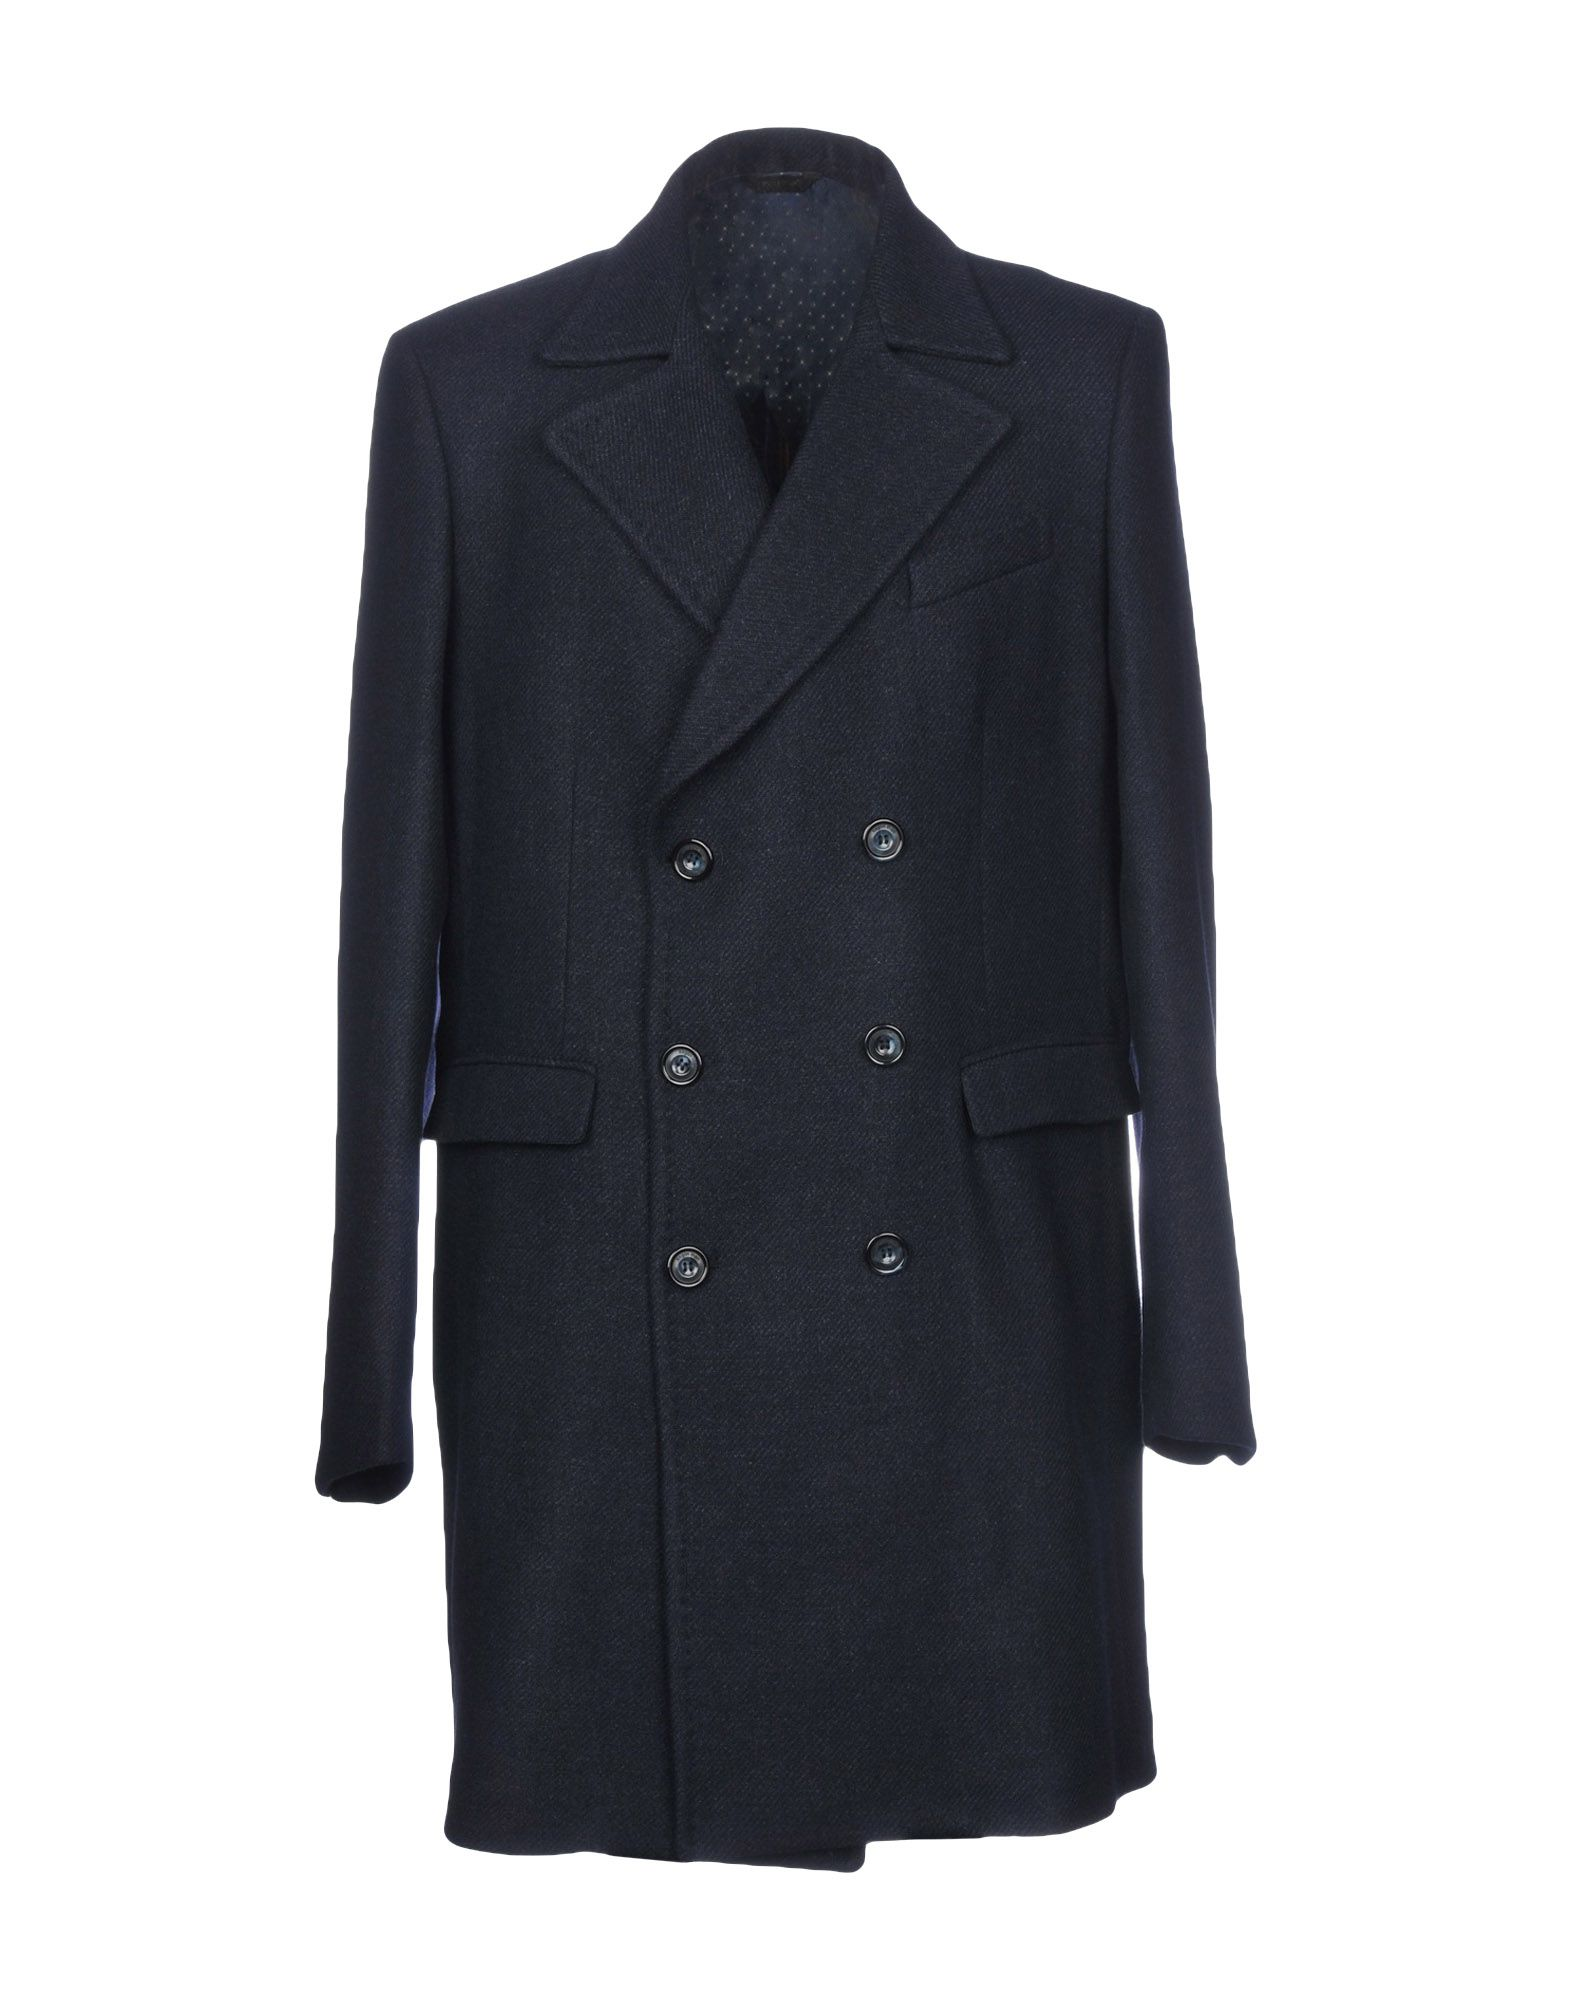 d5c49309c Buy coats & jackets for men - Best men's coats & jackets shop ...